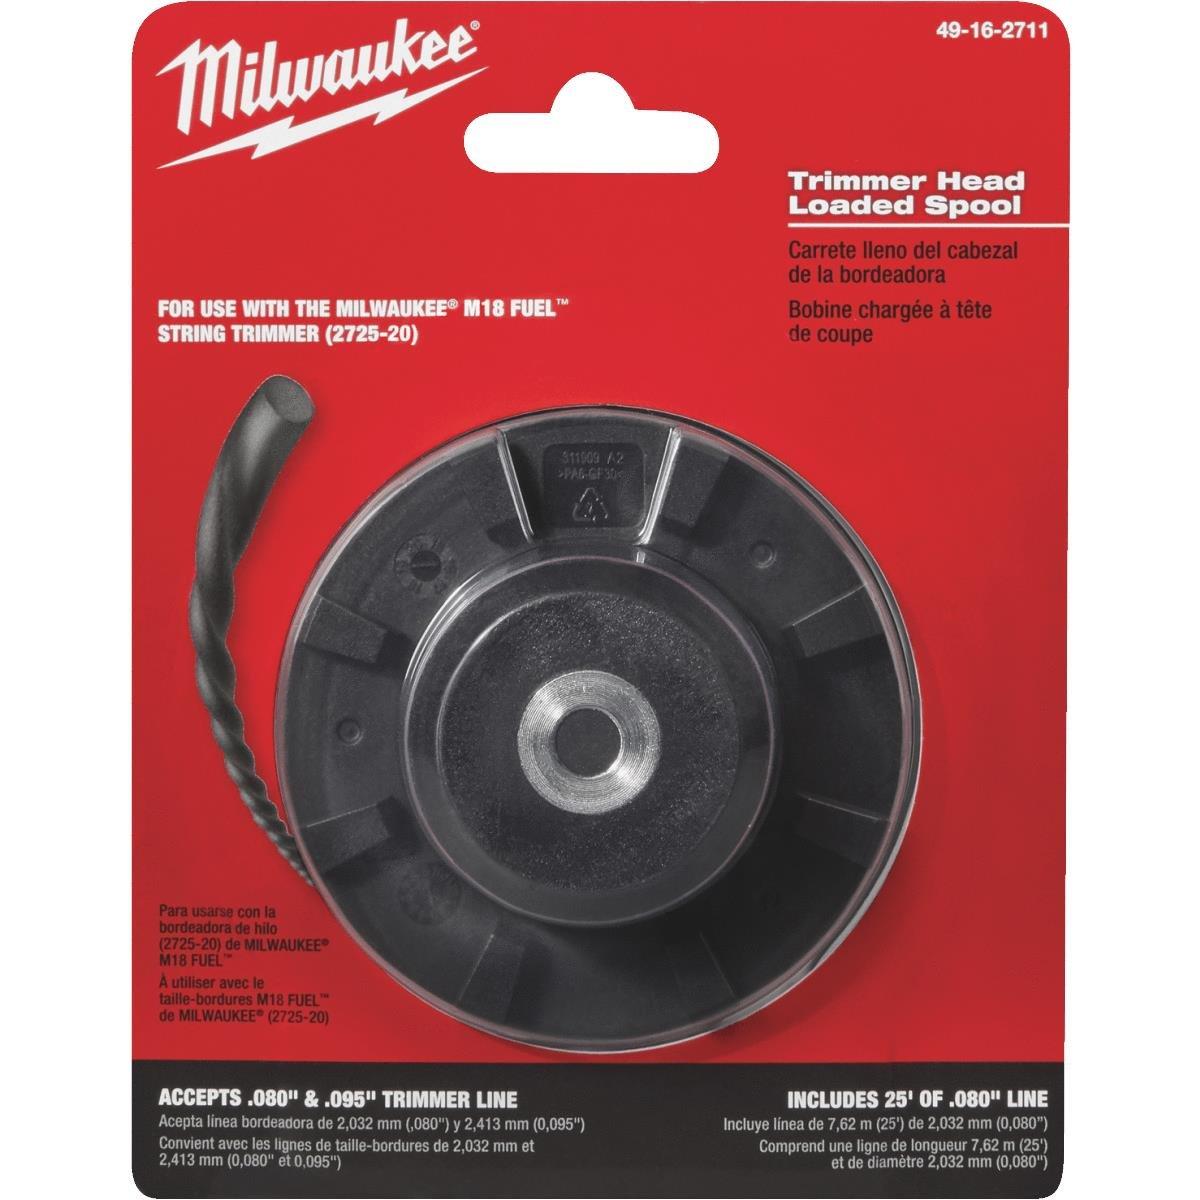 Amazon.com: Milwaukee Loaded Trimmer Head: Industrial ...